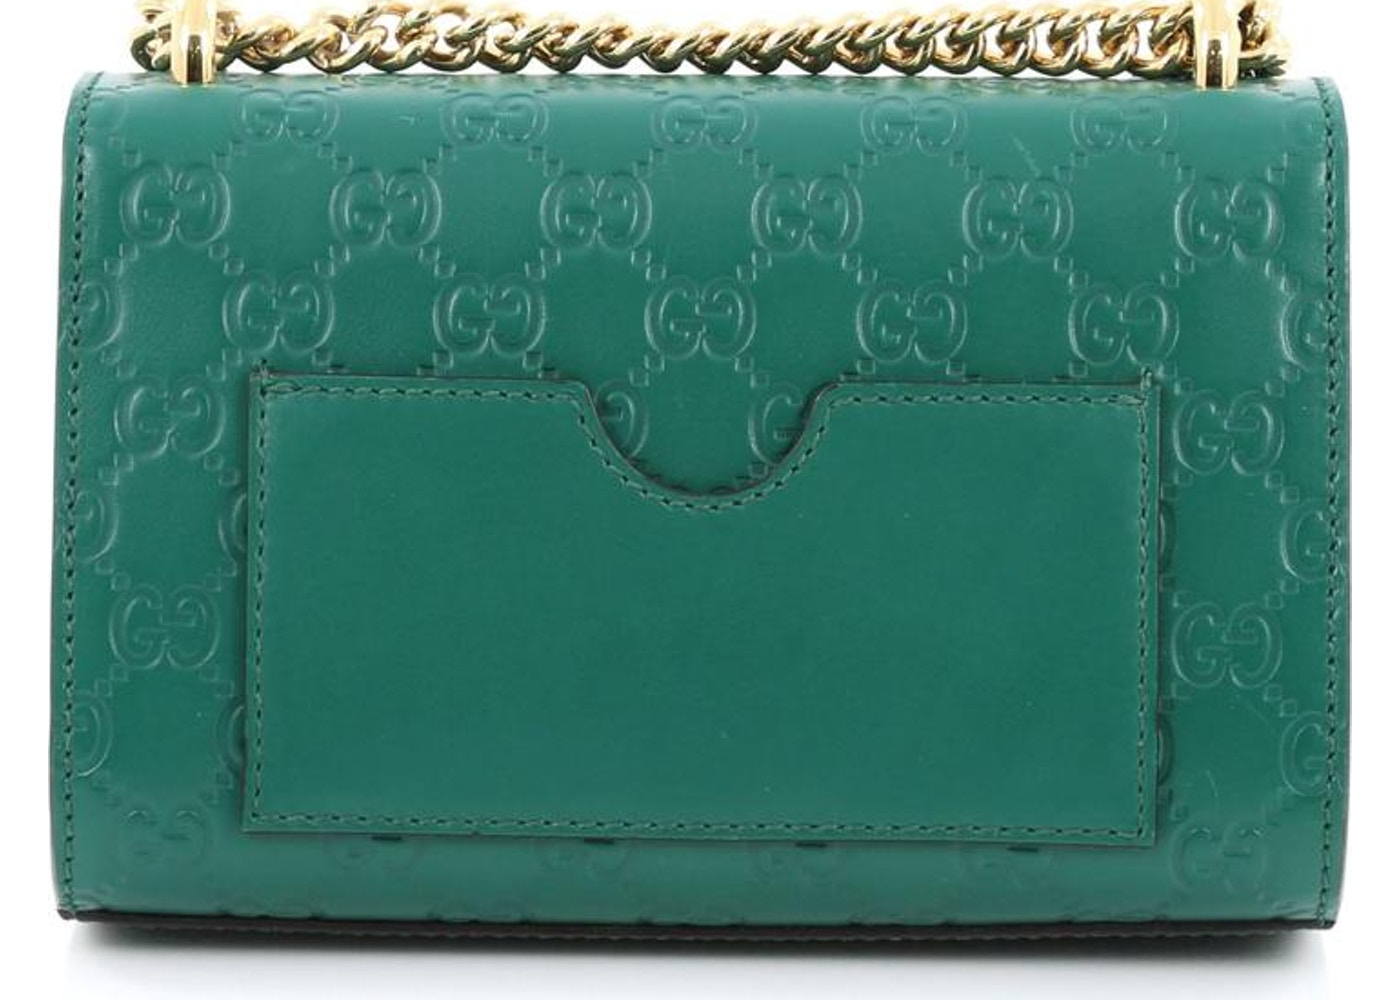 0b6f83ef516ed2 Gucci Padlock Shoulder Guccissima Mini Green